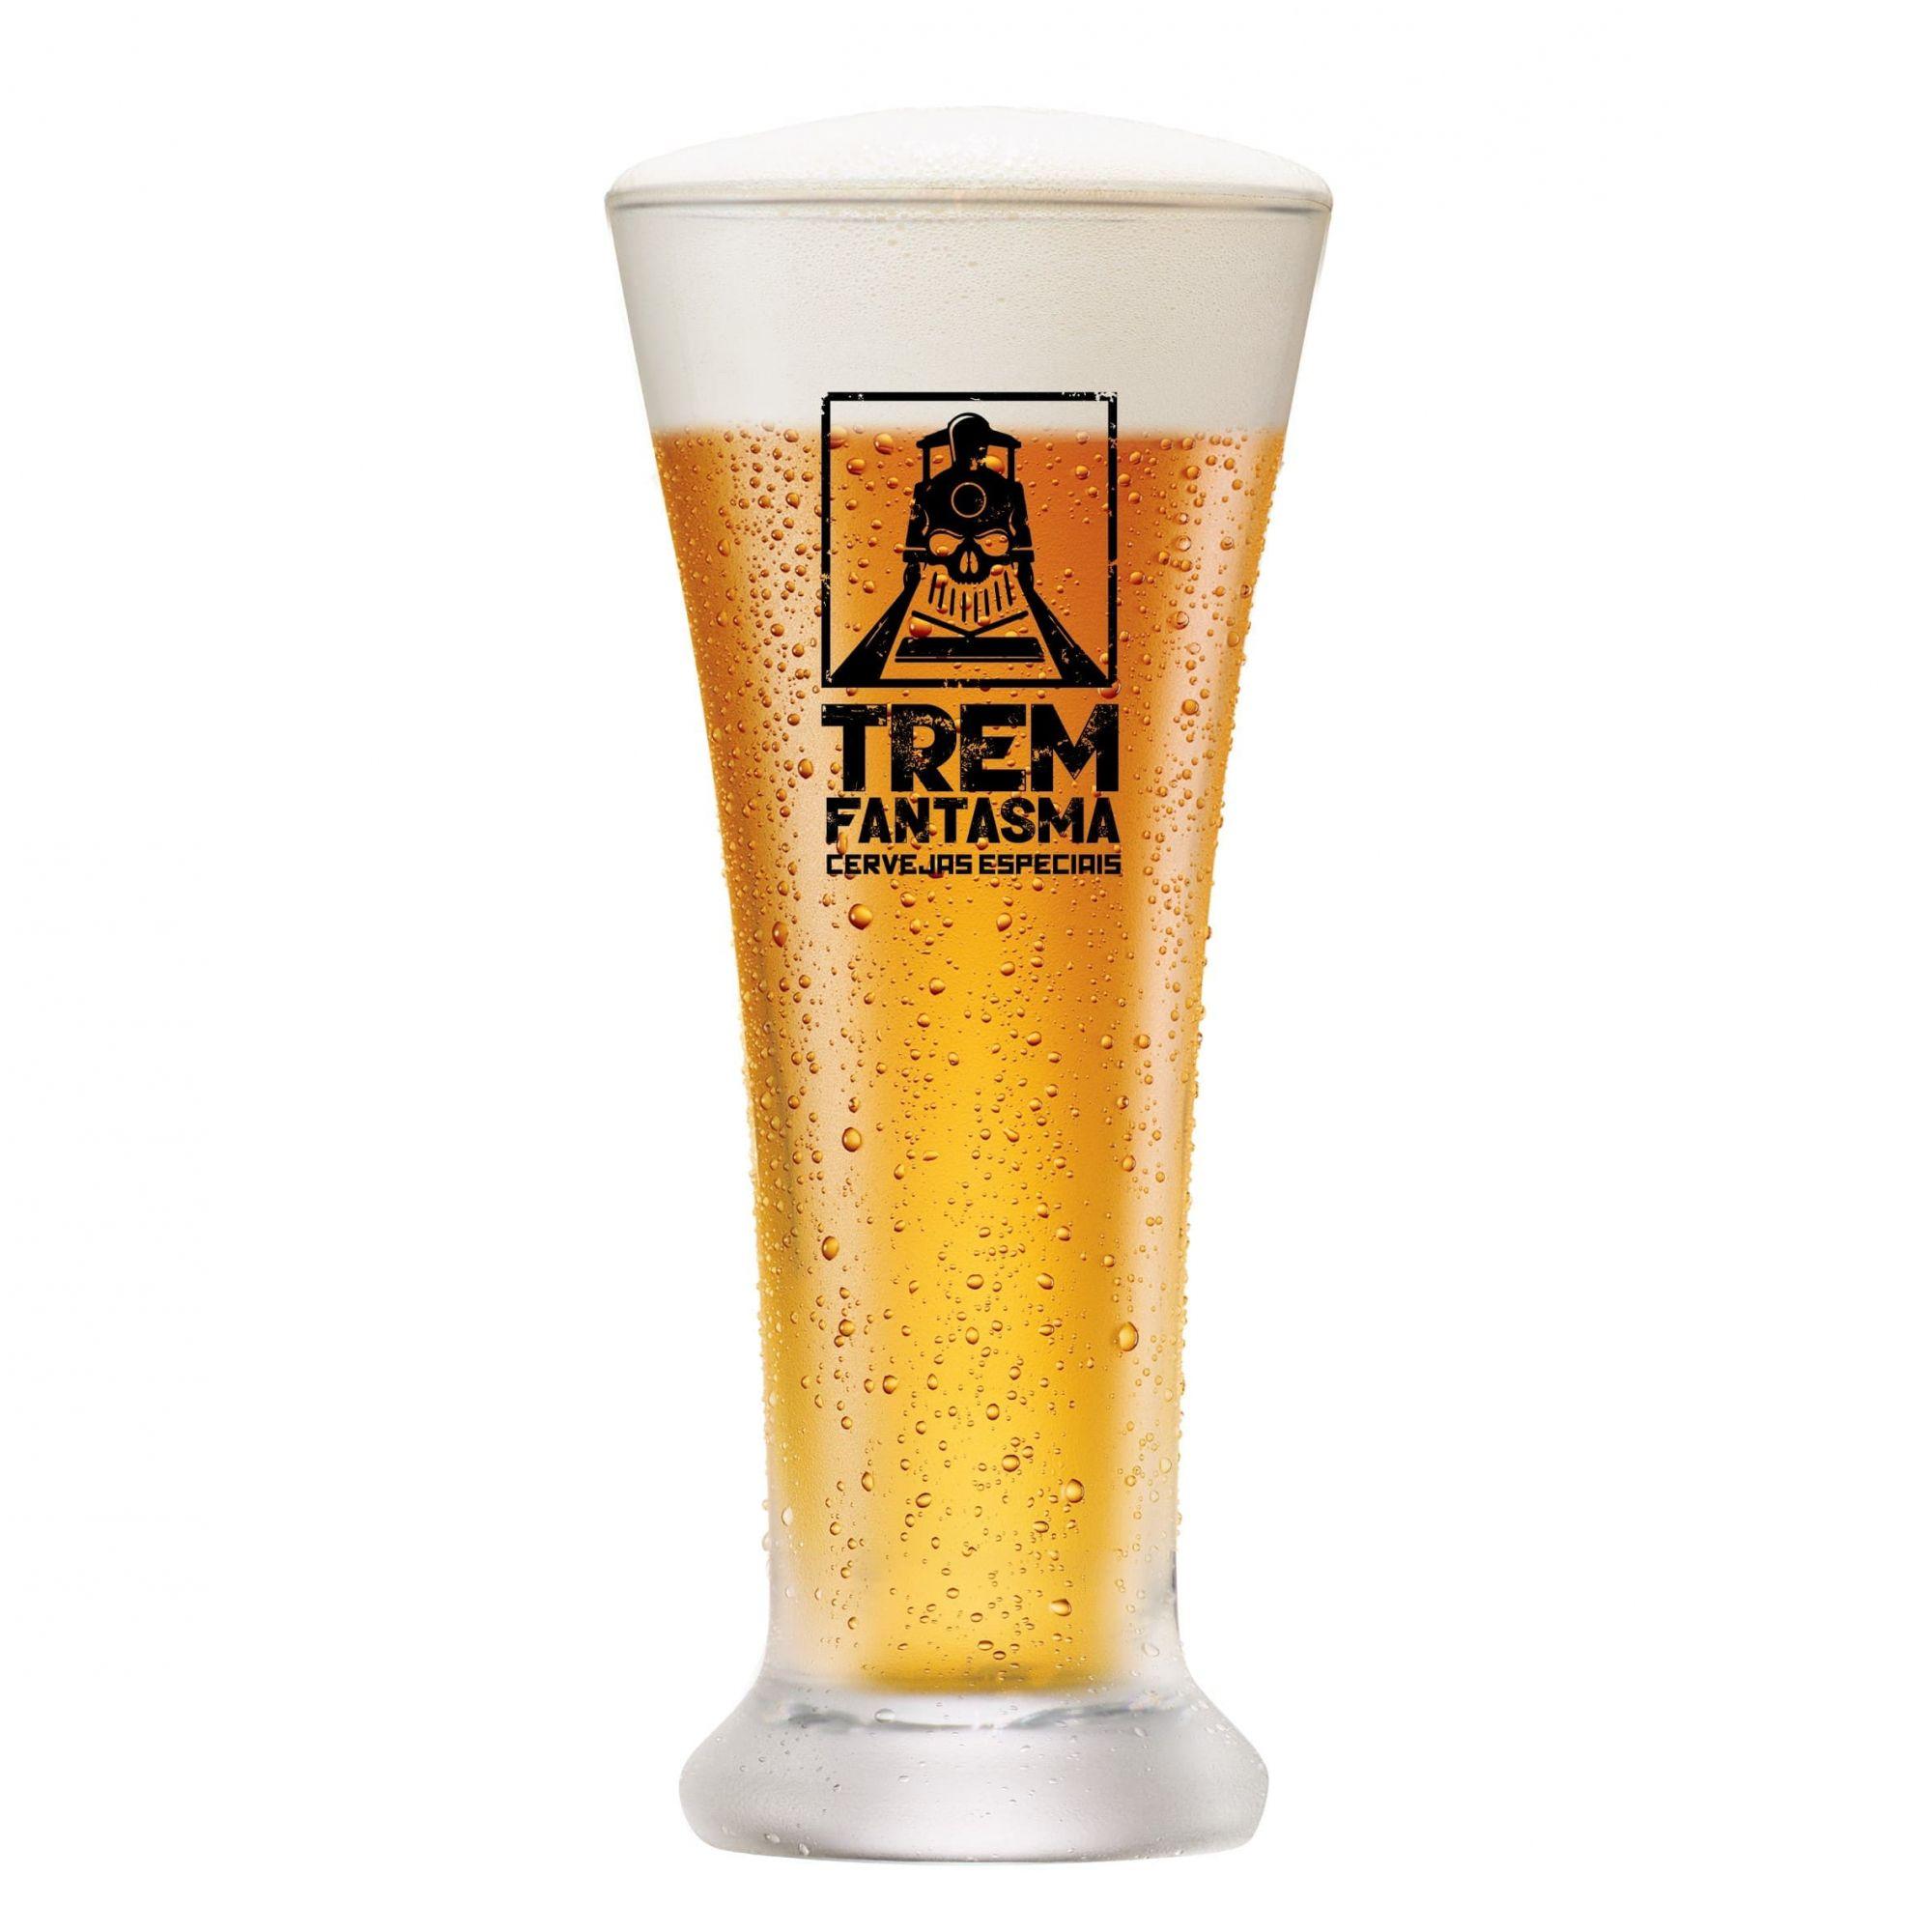 Copo de Cerveja Pilsen - Trem Fantasma 275ml